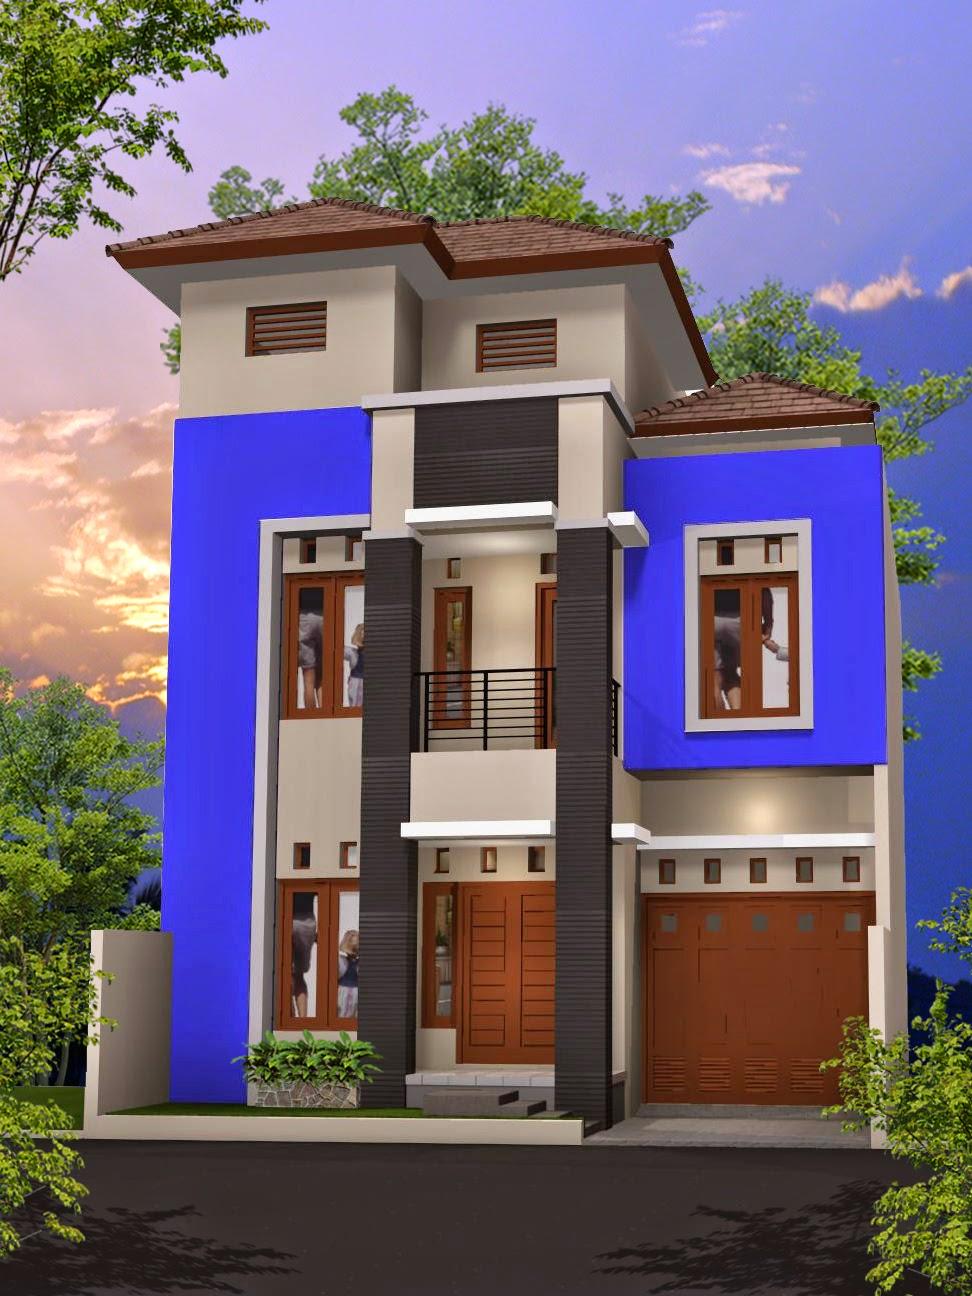 Kumpulan Model Rumah Minimalis 3 Lantai 2021 | INFORMASI ...